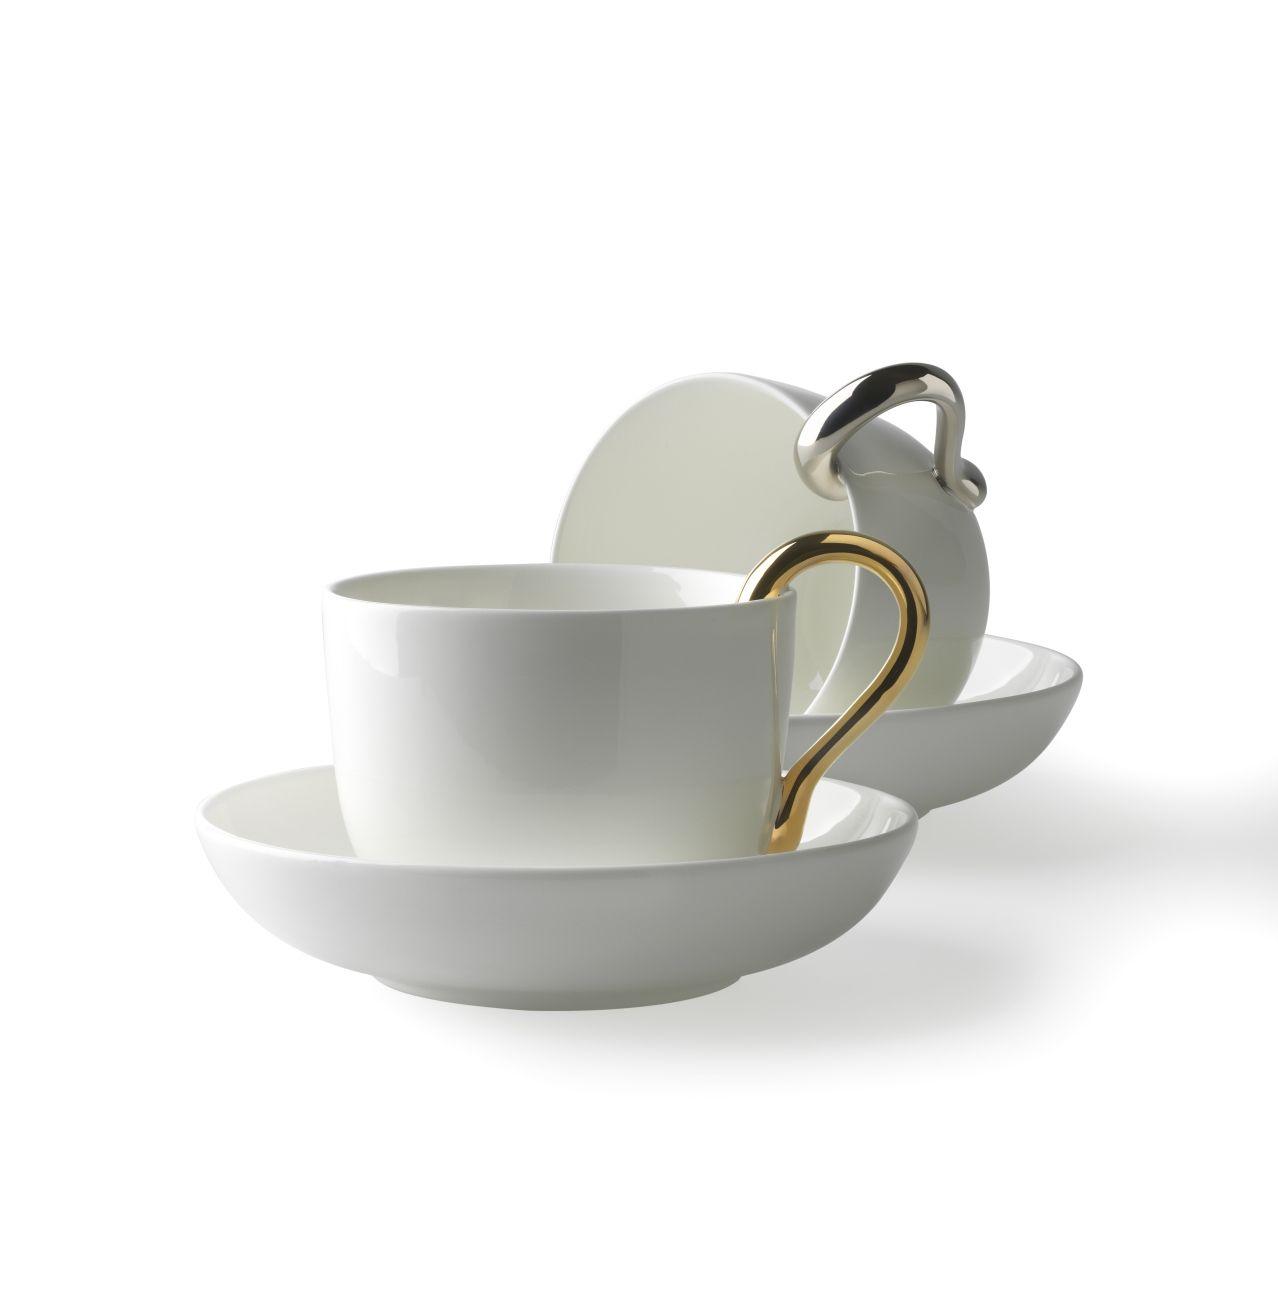 mine cup anna kraitz for design house stockholm - Dinnerware Design House Stockholm